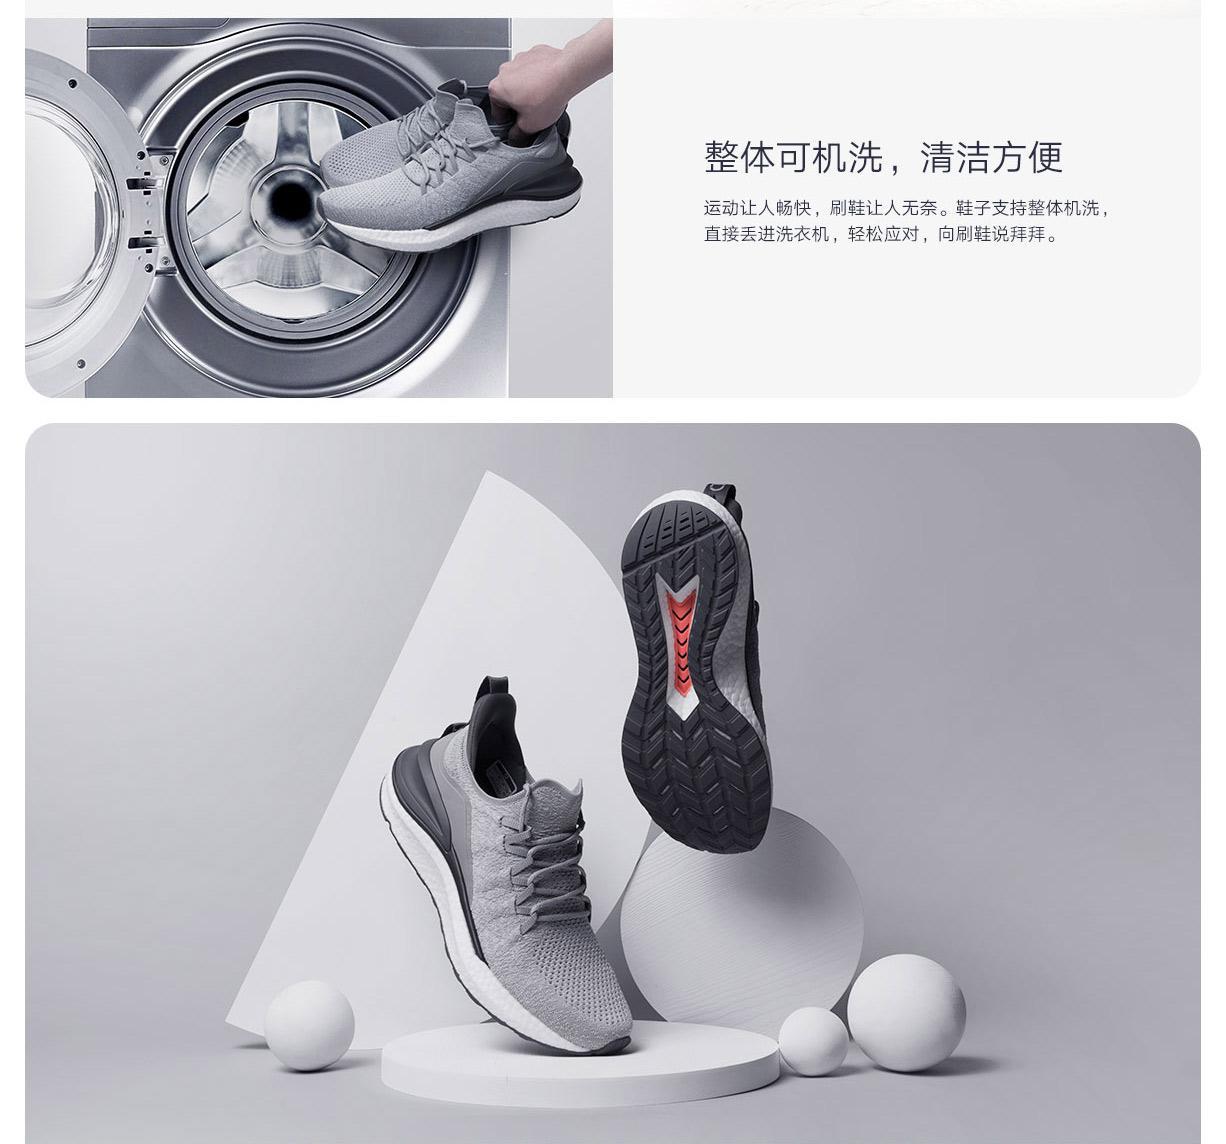 Кроссовки Xiaomi Mijia Sneakers 4 за29 долларов — рекомендованная цена